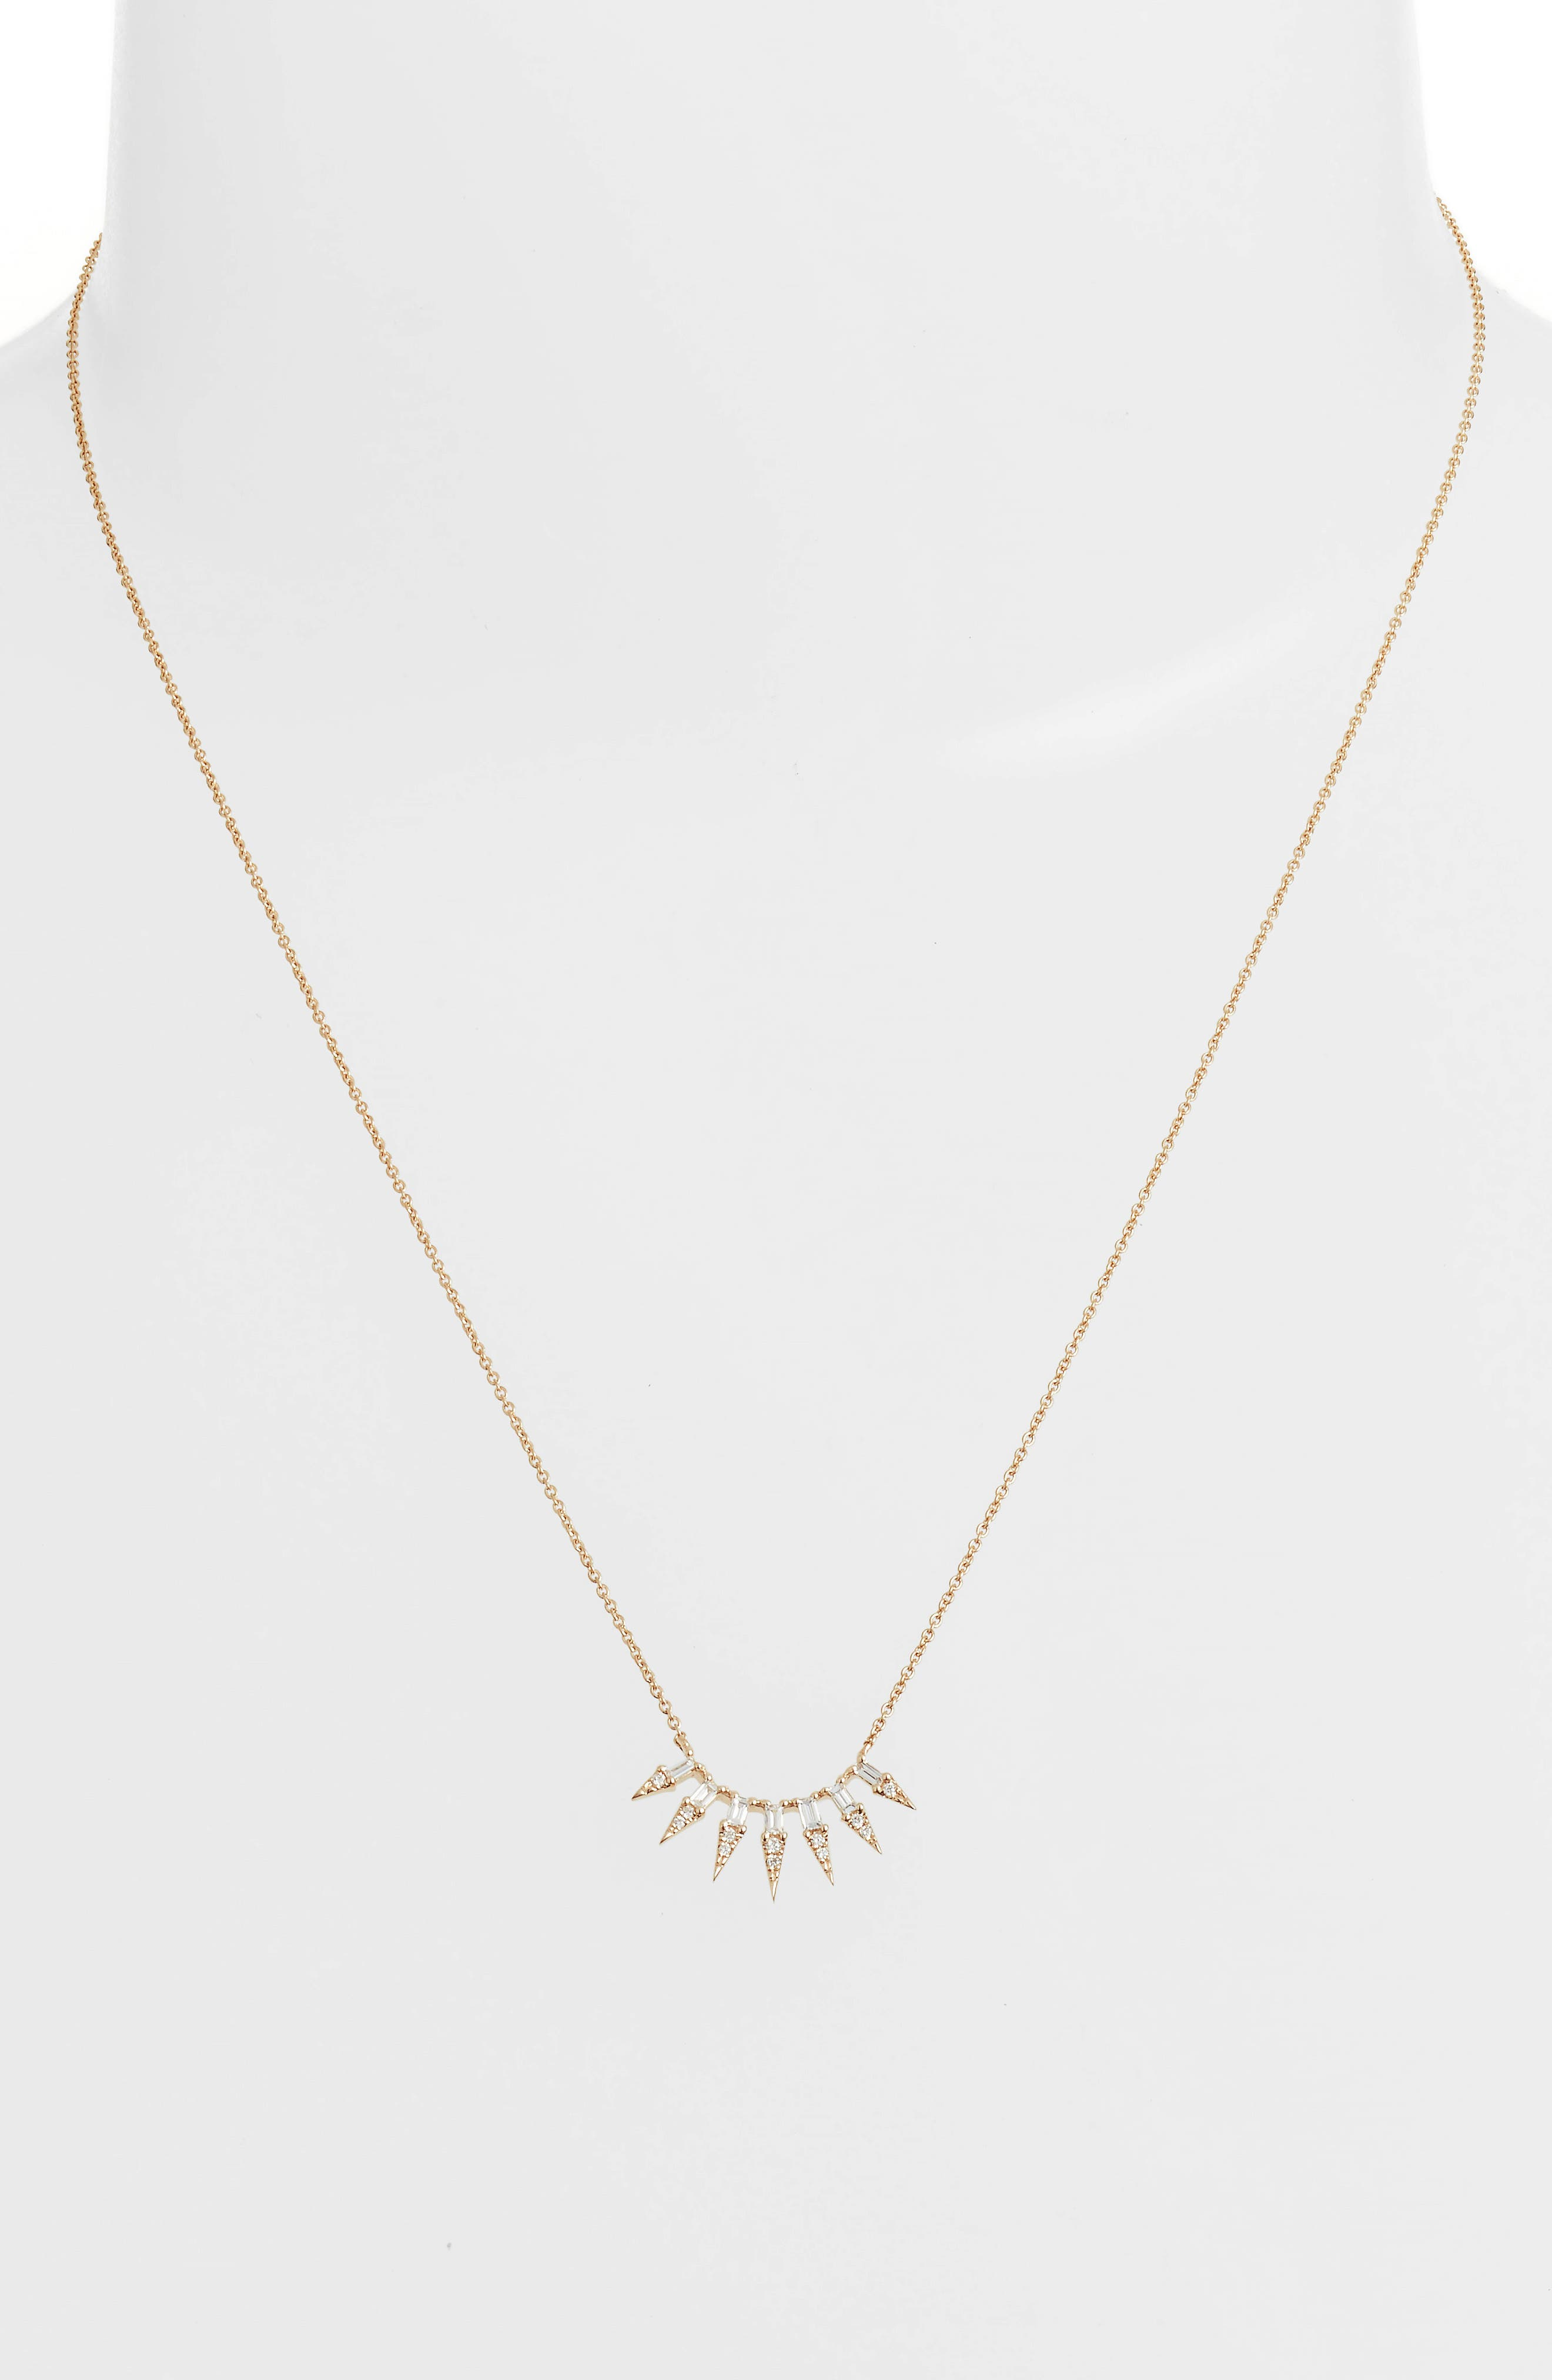 Sadie Pearl Seven Dagger Diamond Necklace,                             Alternate thumbnail 2, color,                             Yellow Gold